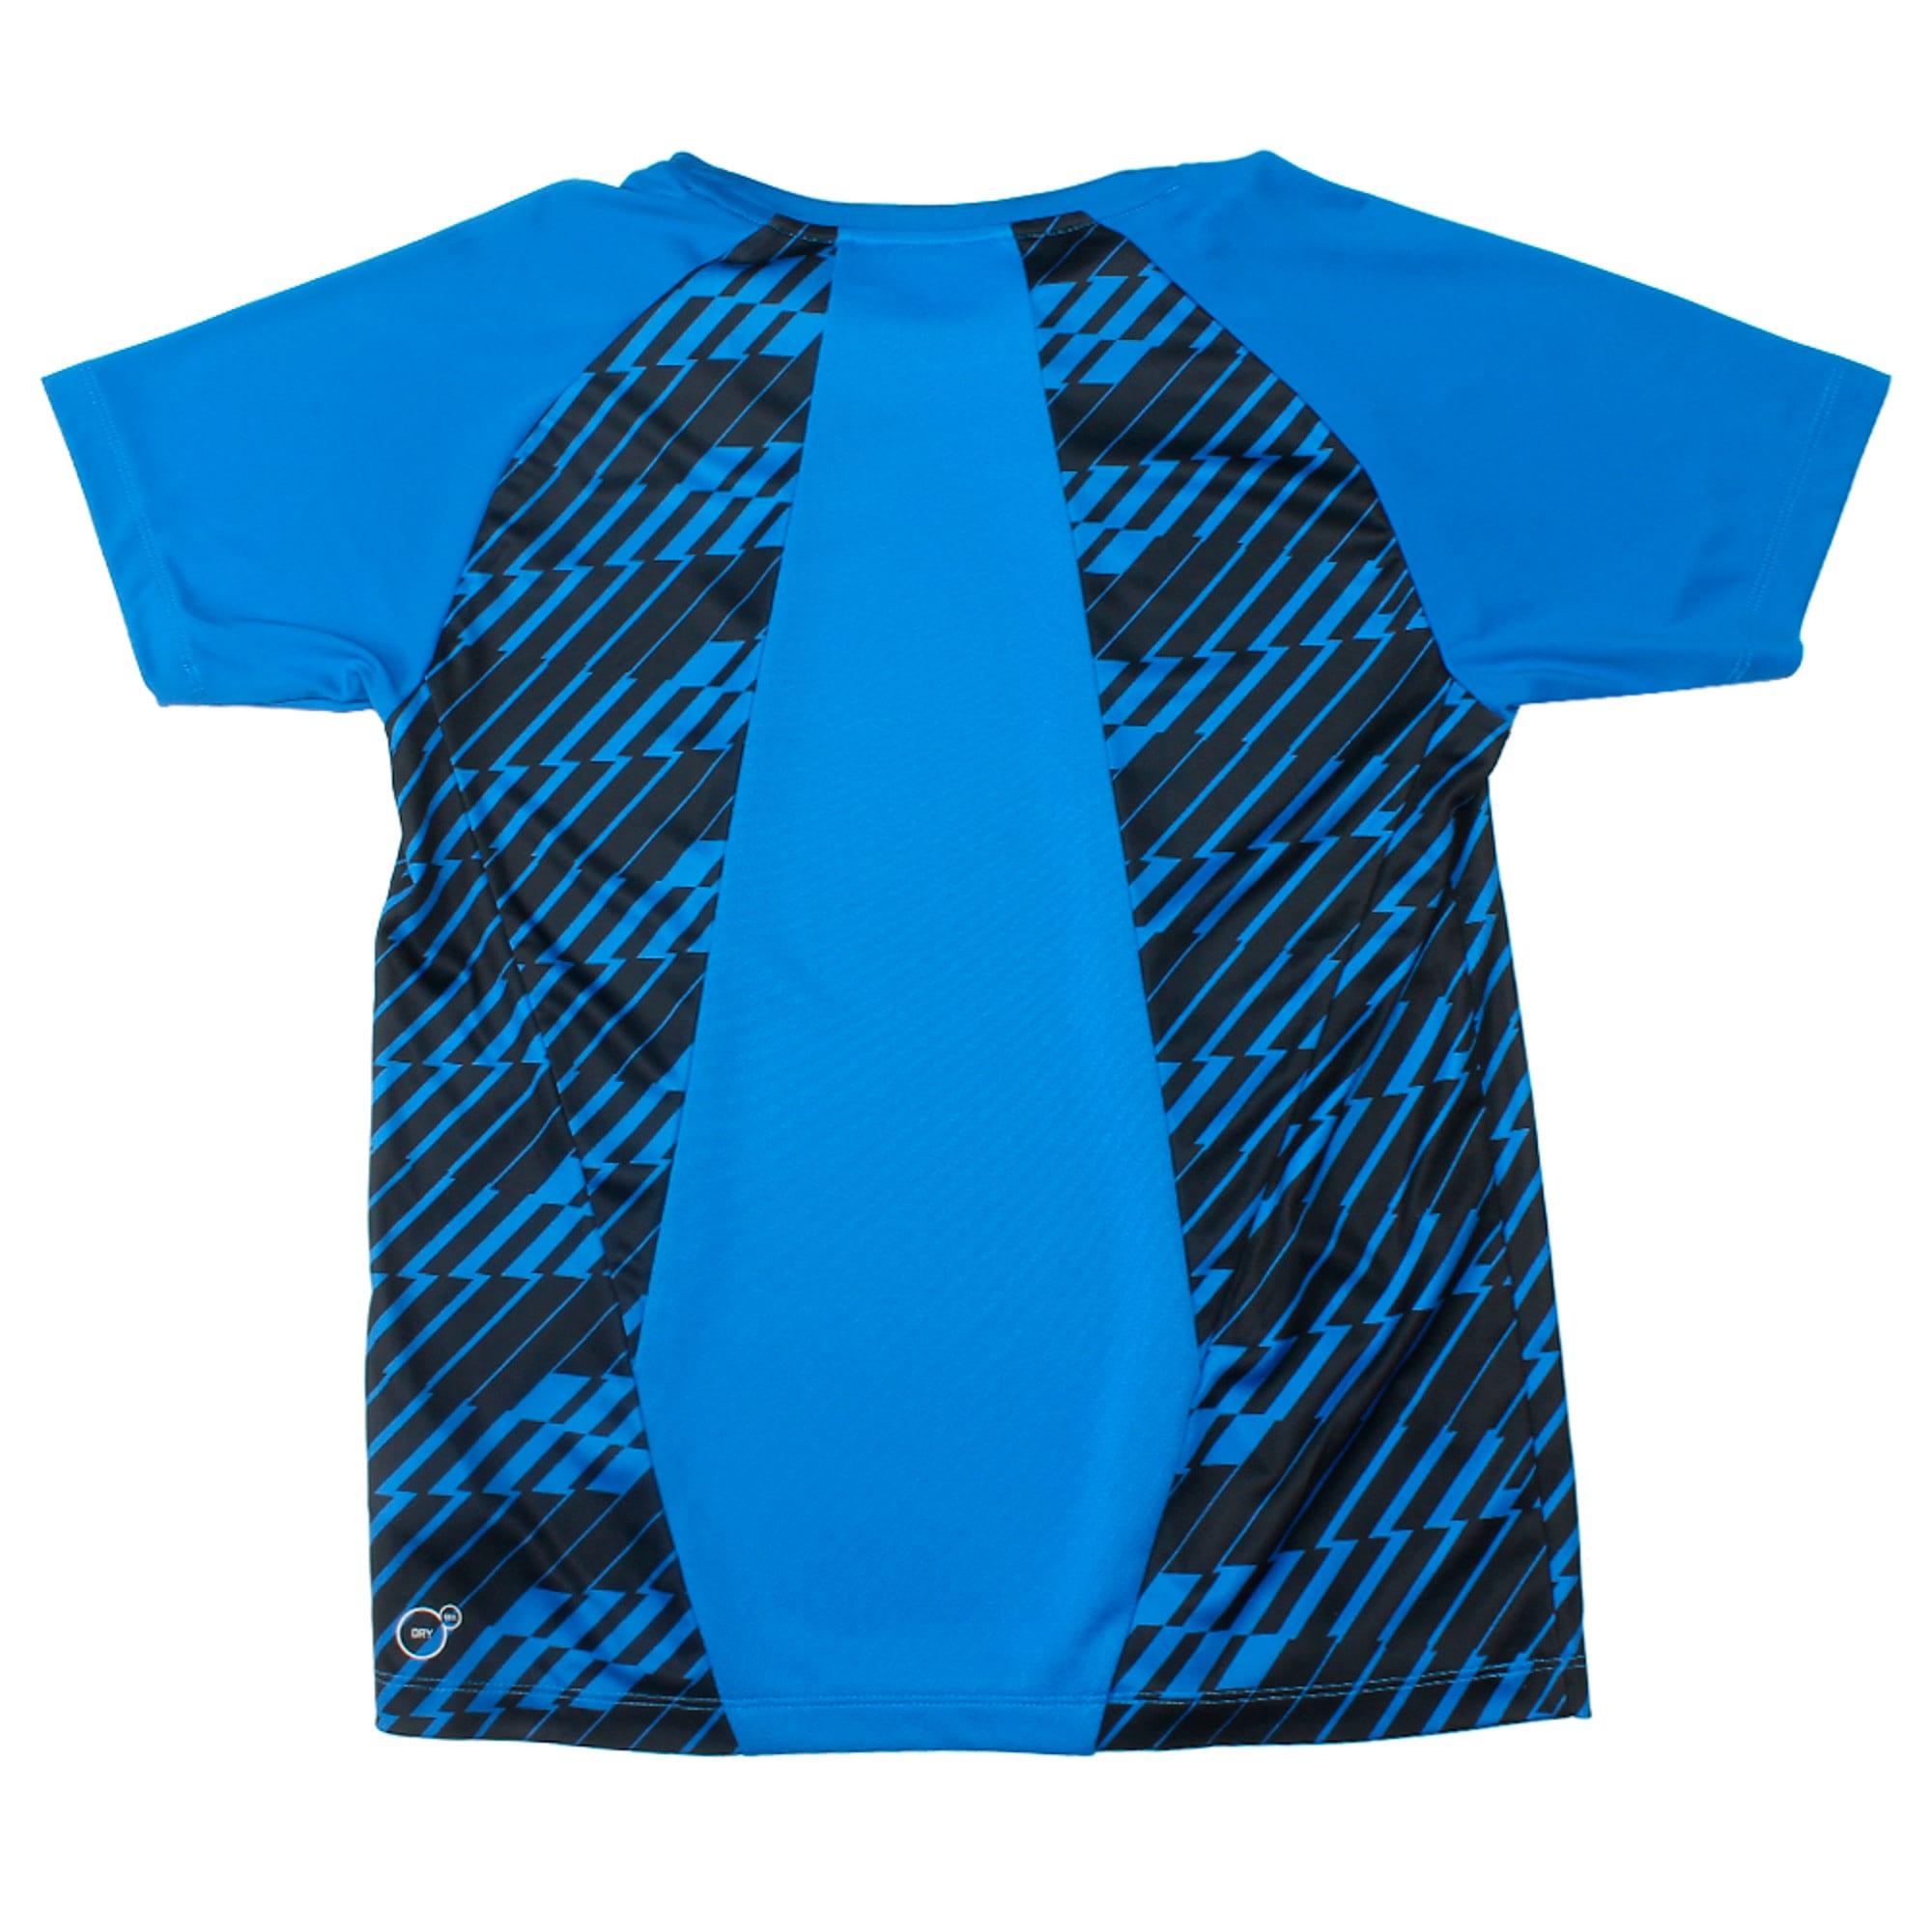 Thumbnail 3 of Gym Graphic AOP Tee B Puma Black, Strong Blue, medium-IND